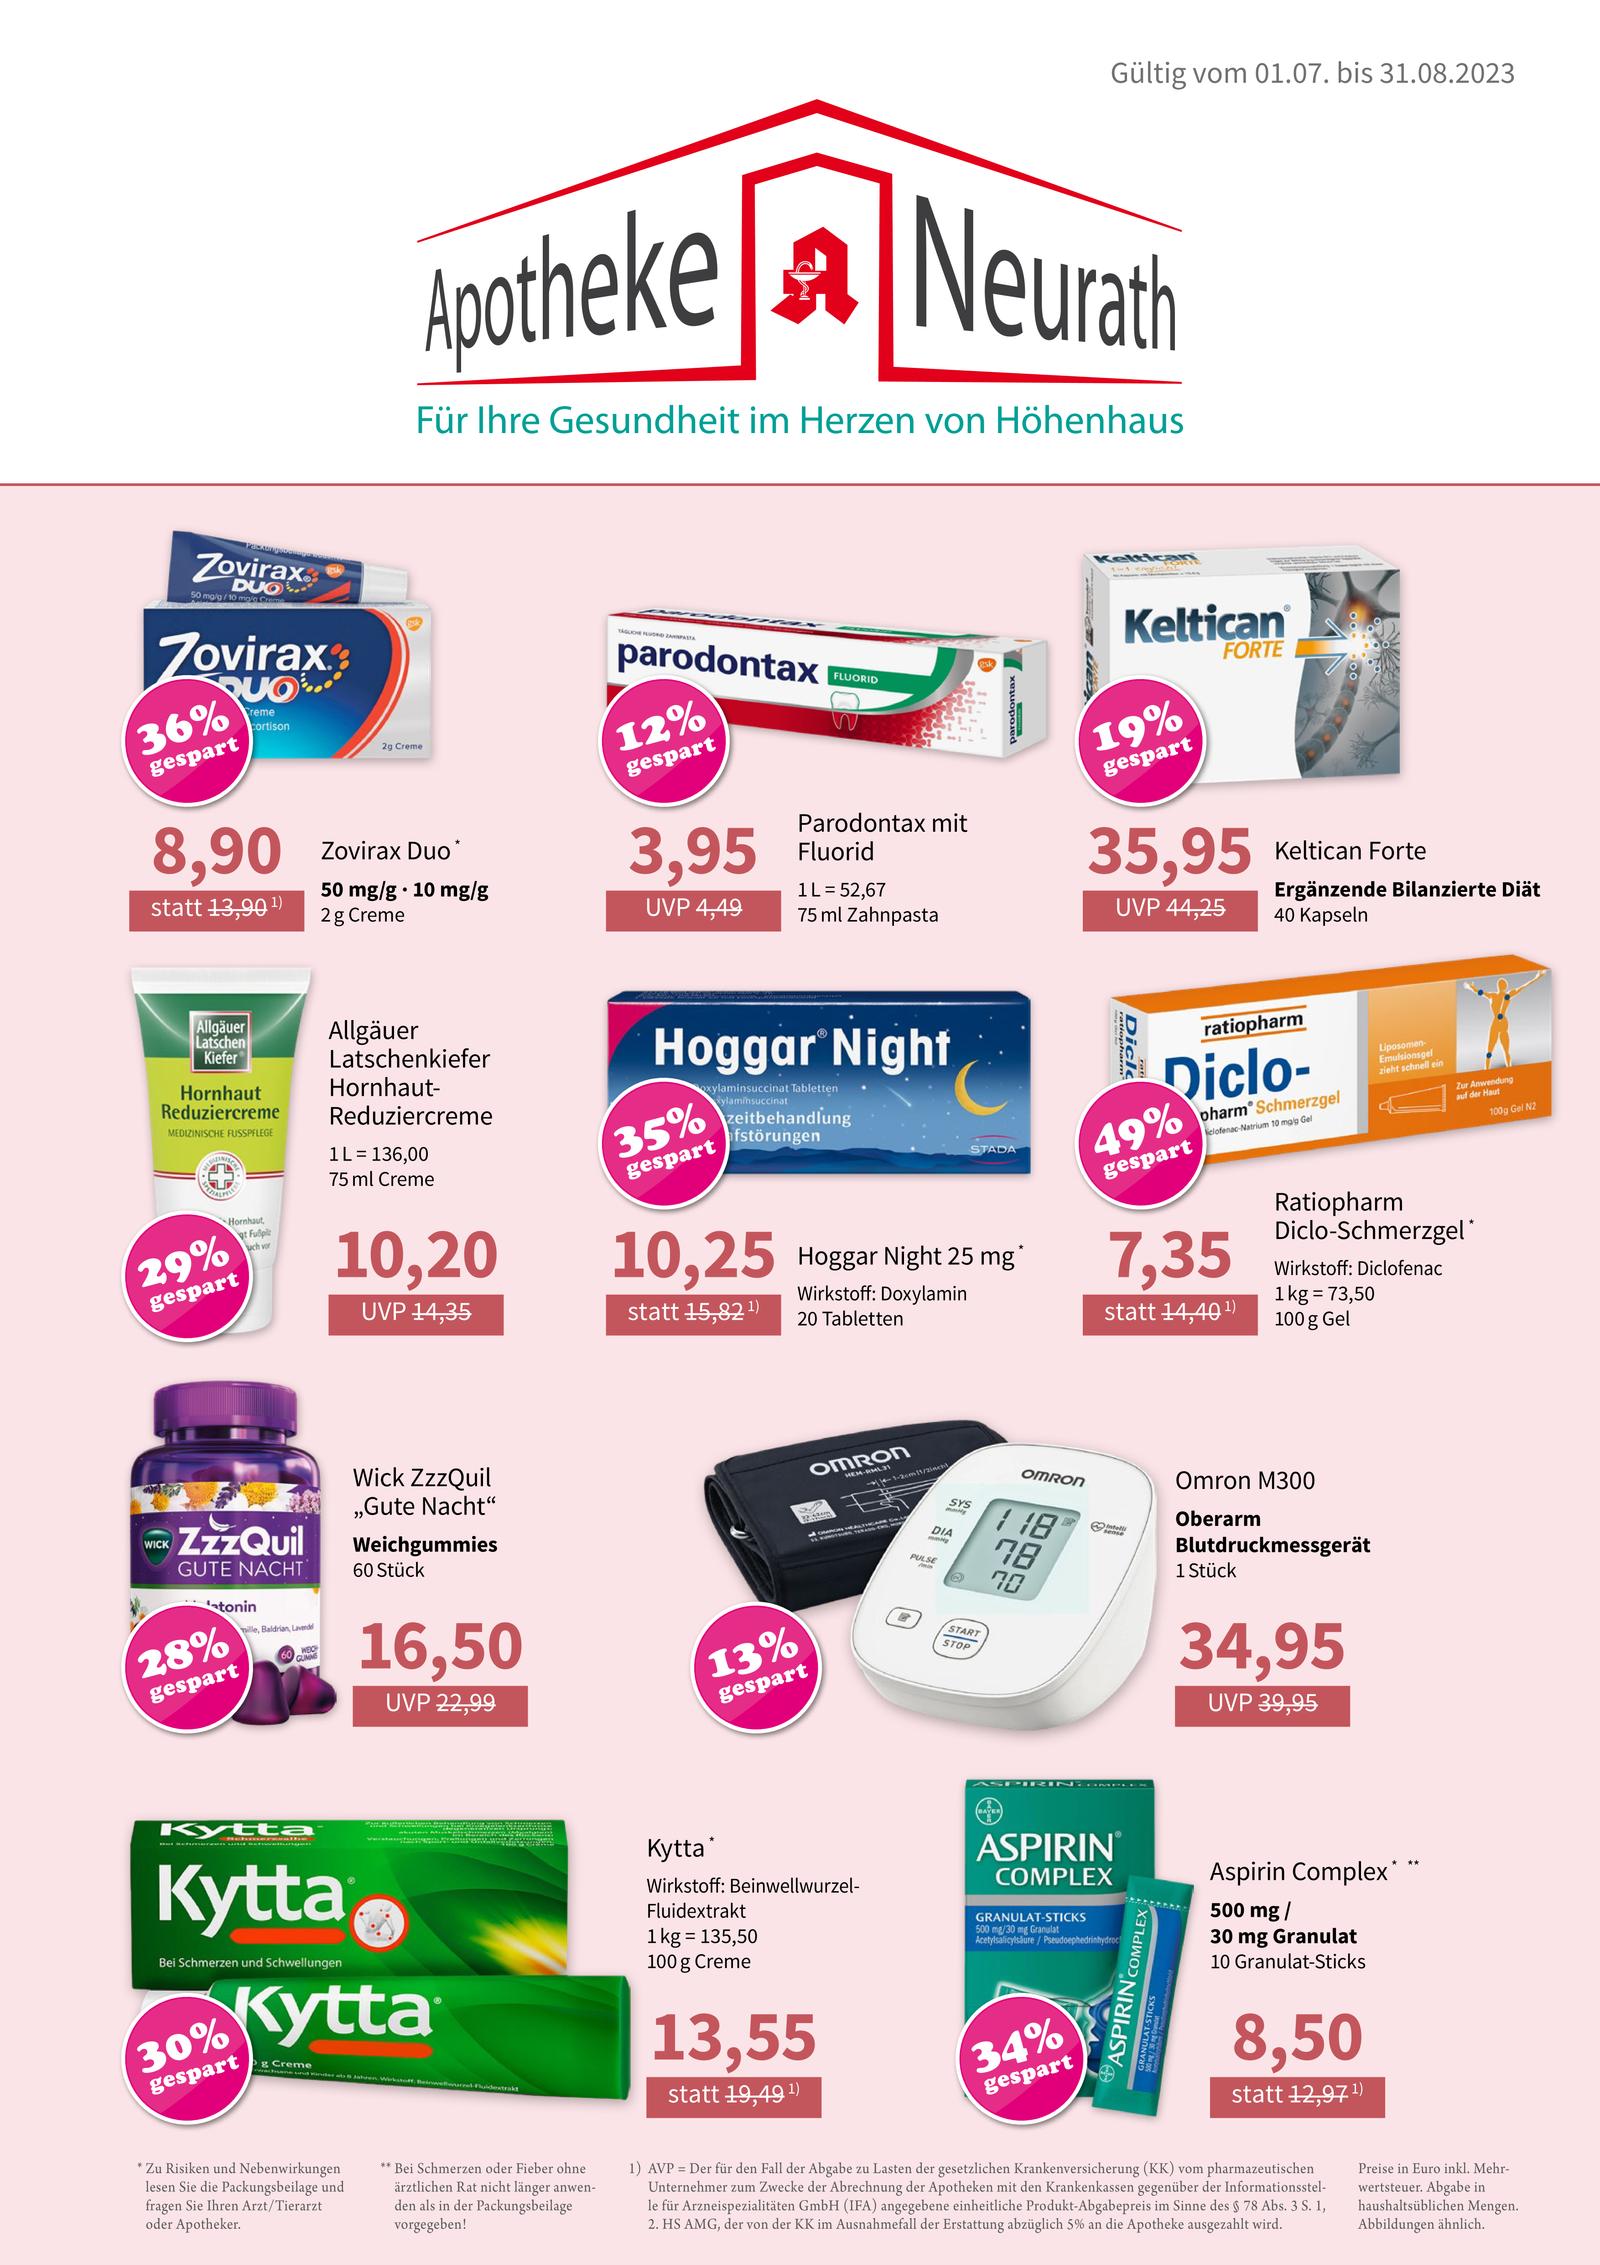 https://mein-uploads.apocdn.net/9767/leaflets/9767_flyer-Seite2.png